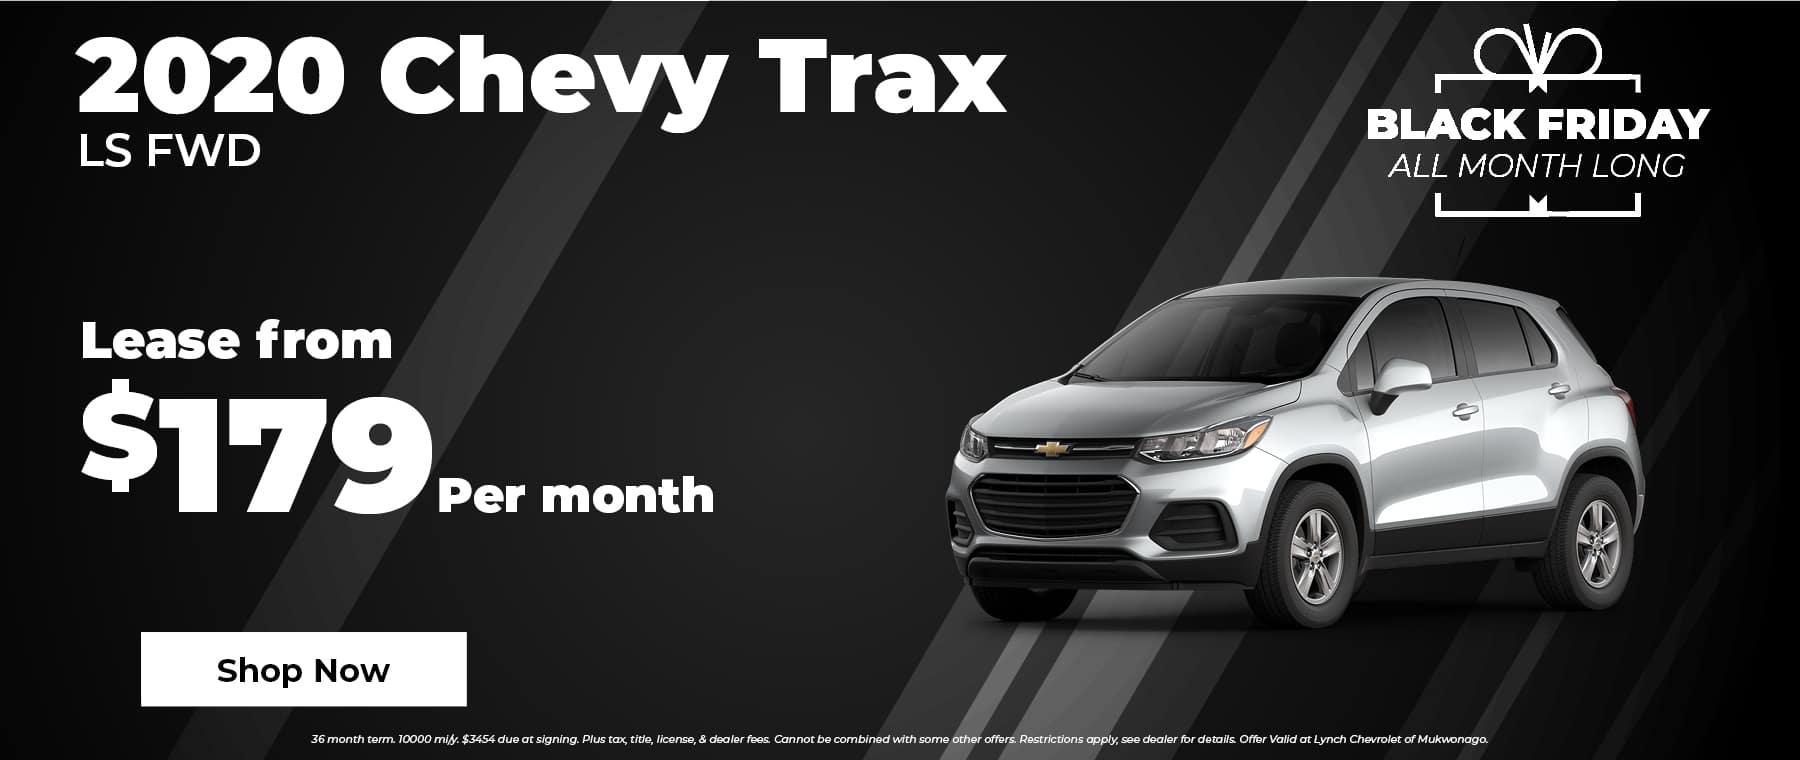 2020 Chevy Trax $179 per month in Mukwonago Wisconsin